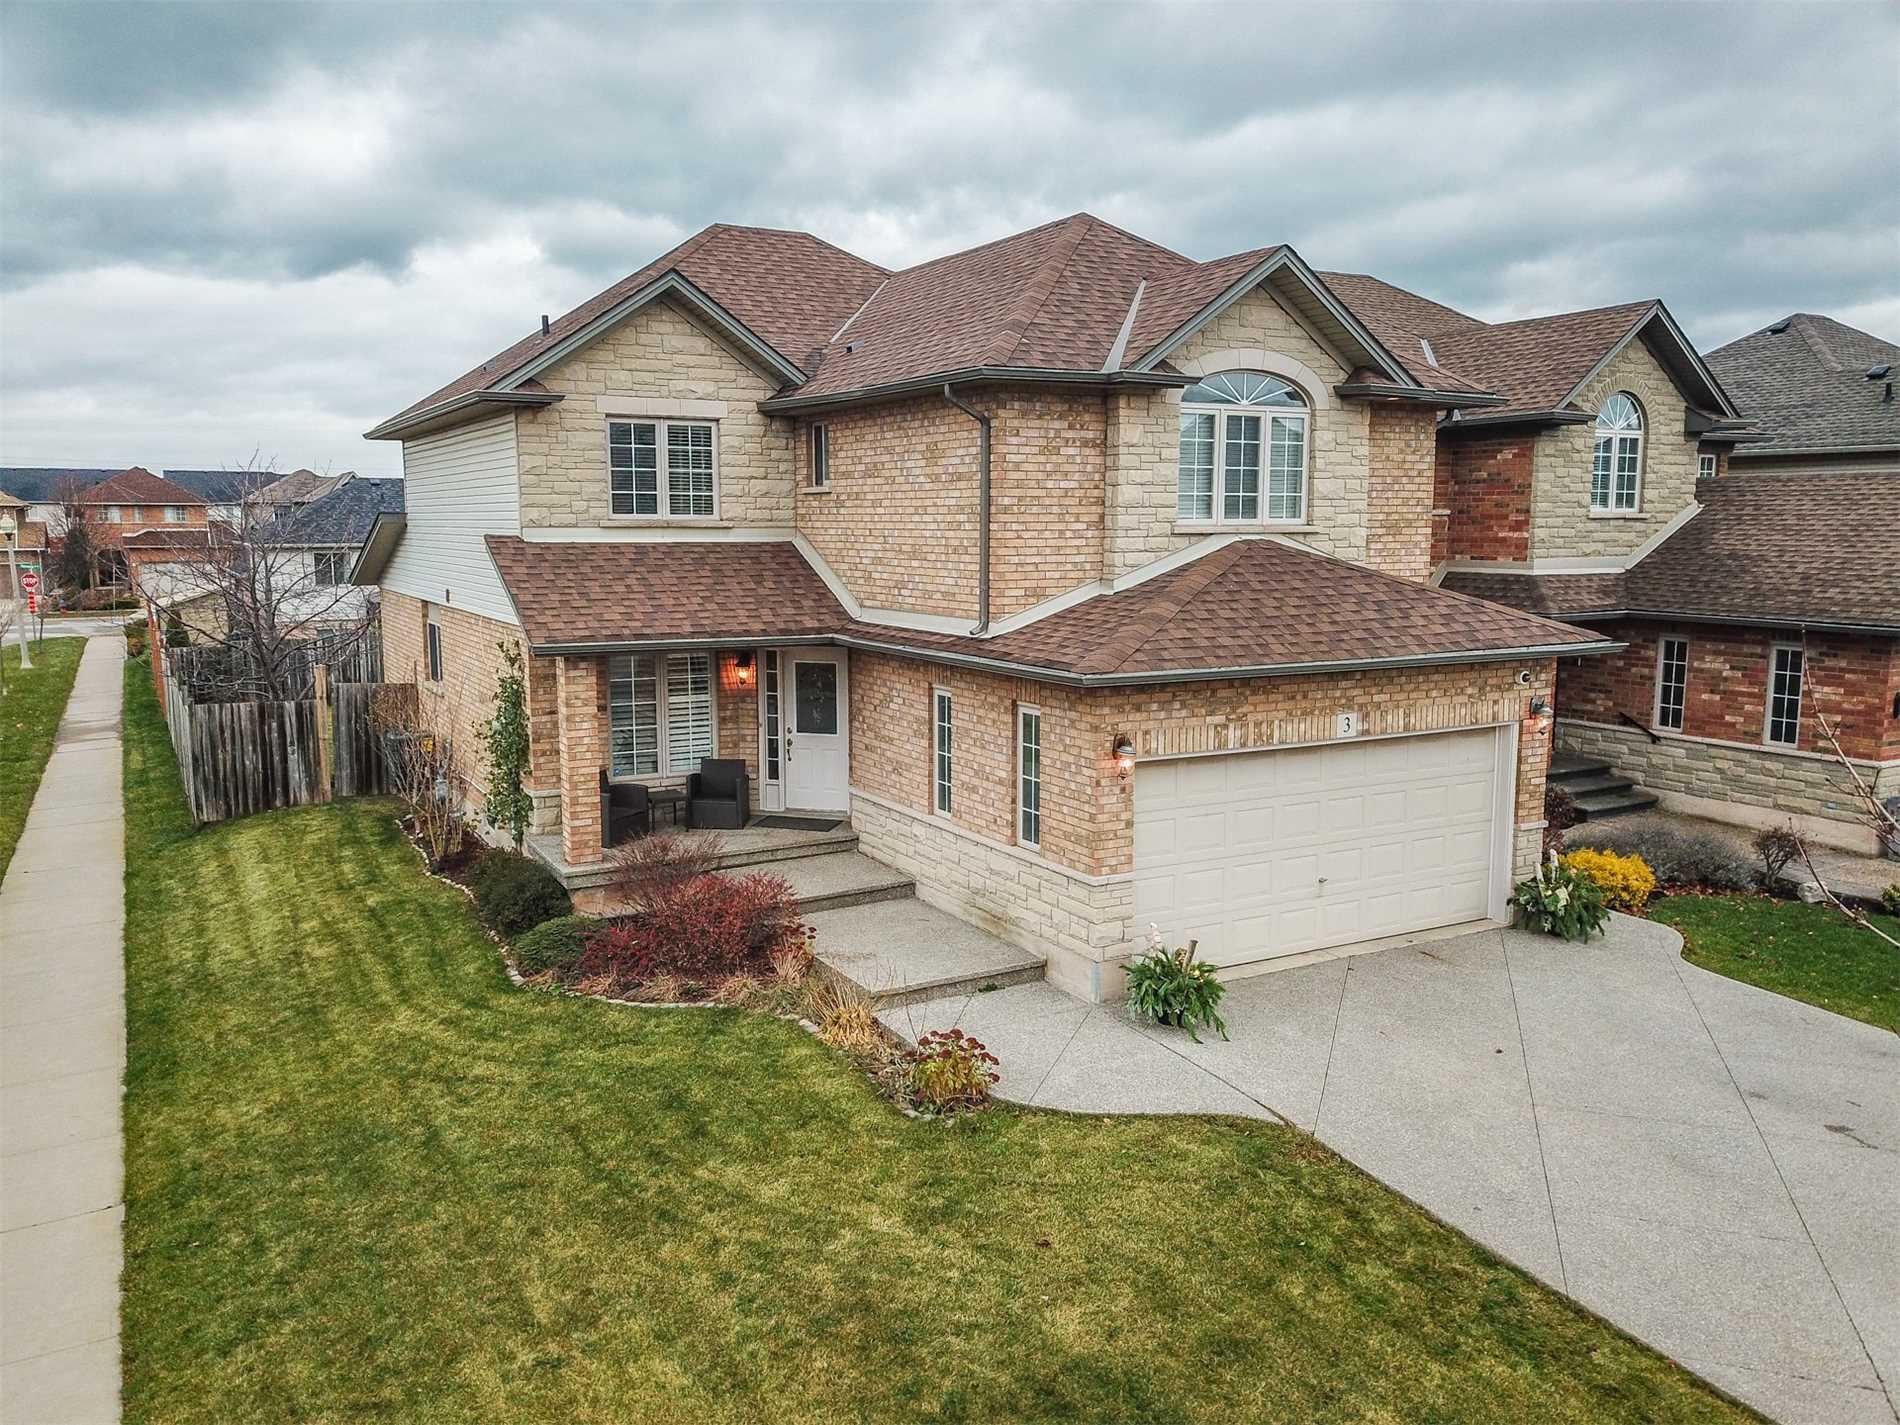 House for sale at 3 Benziger Lane Lane Hamilton Ontario - MLS: X4312802